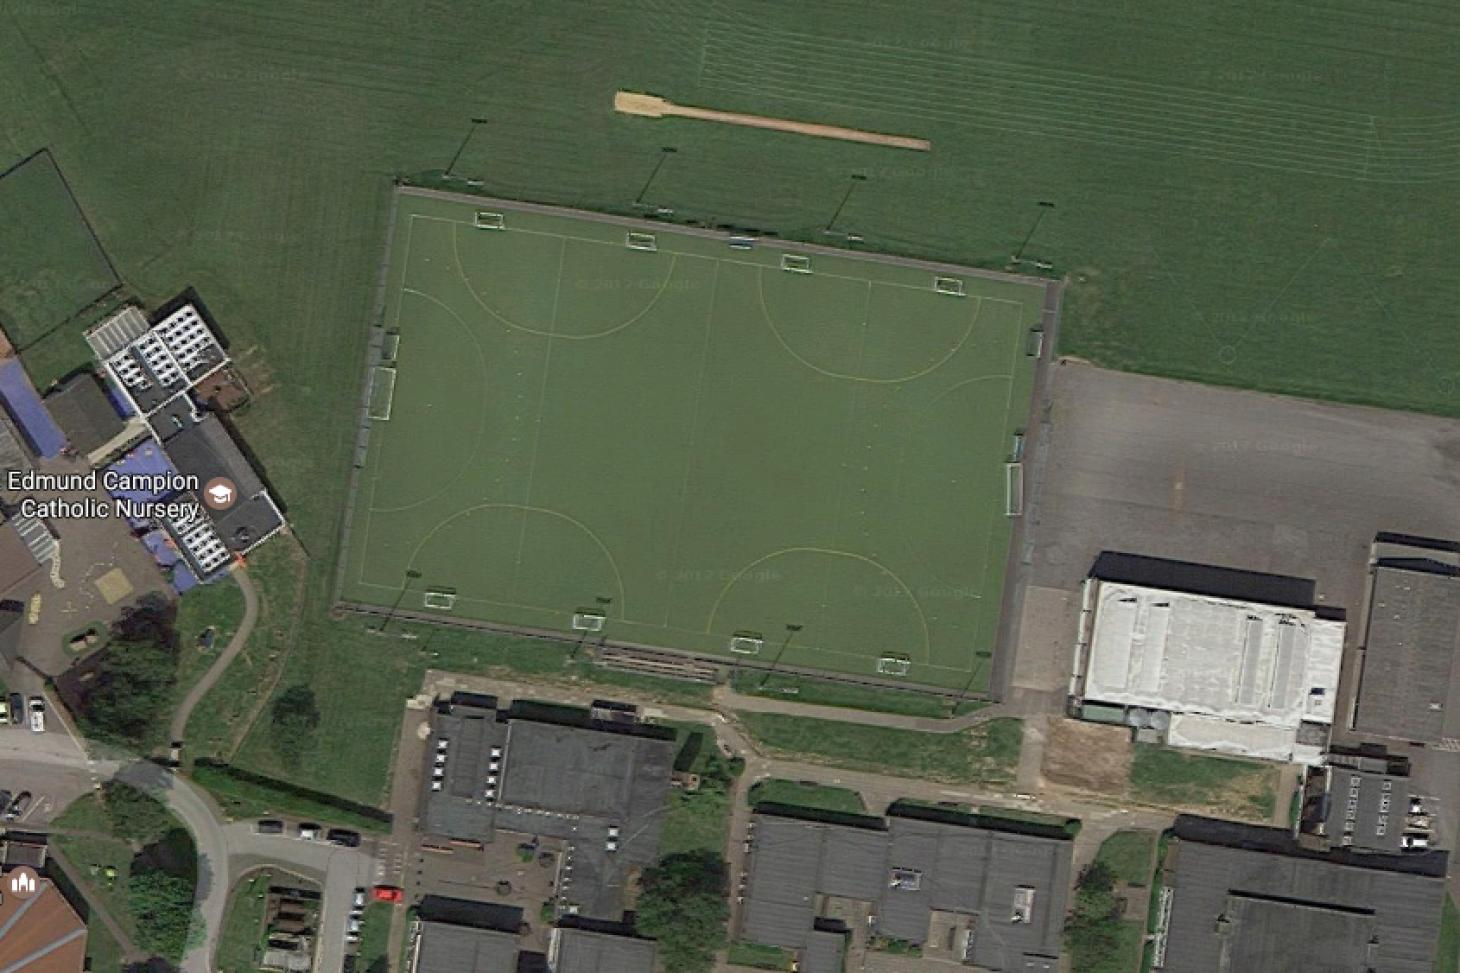 Altwood Church of England School 5 a side | Astroturf football pitch